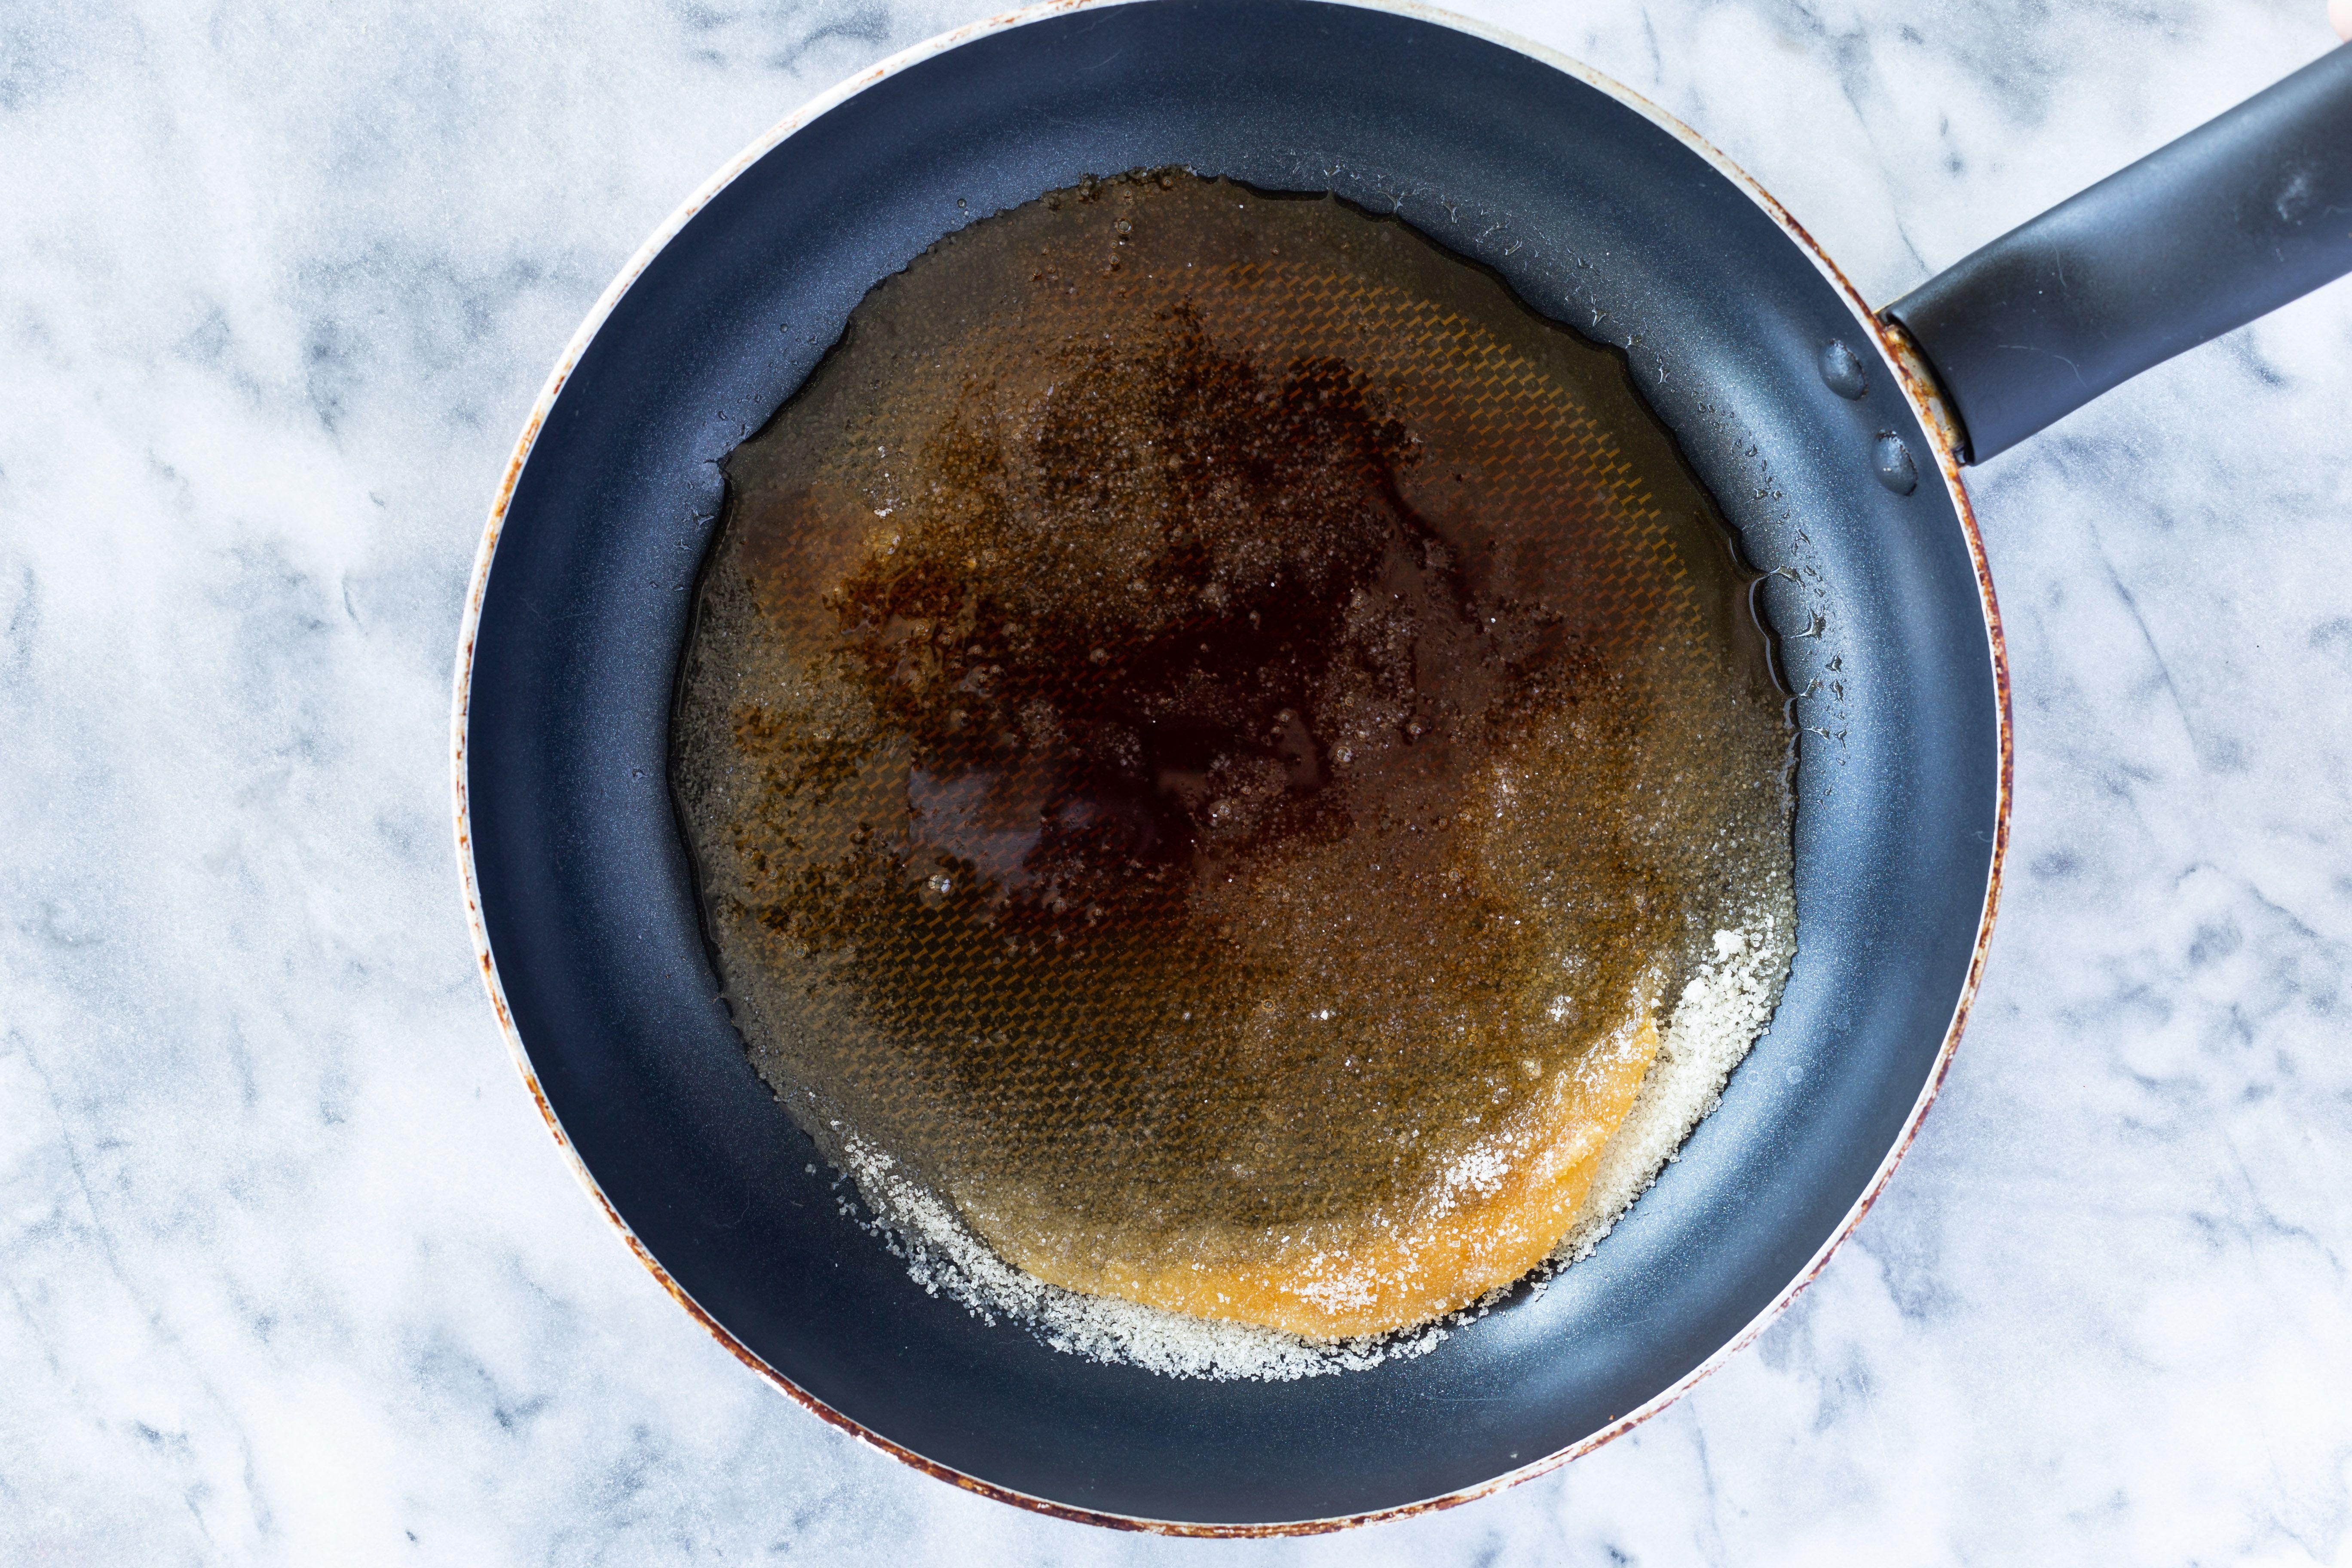 Sugar caramelizing in a pan